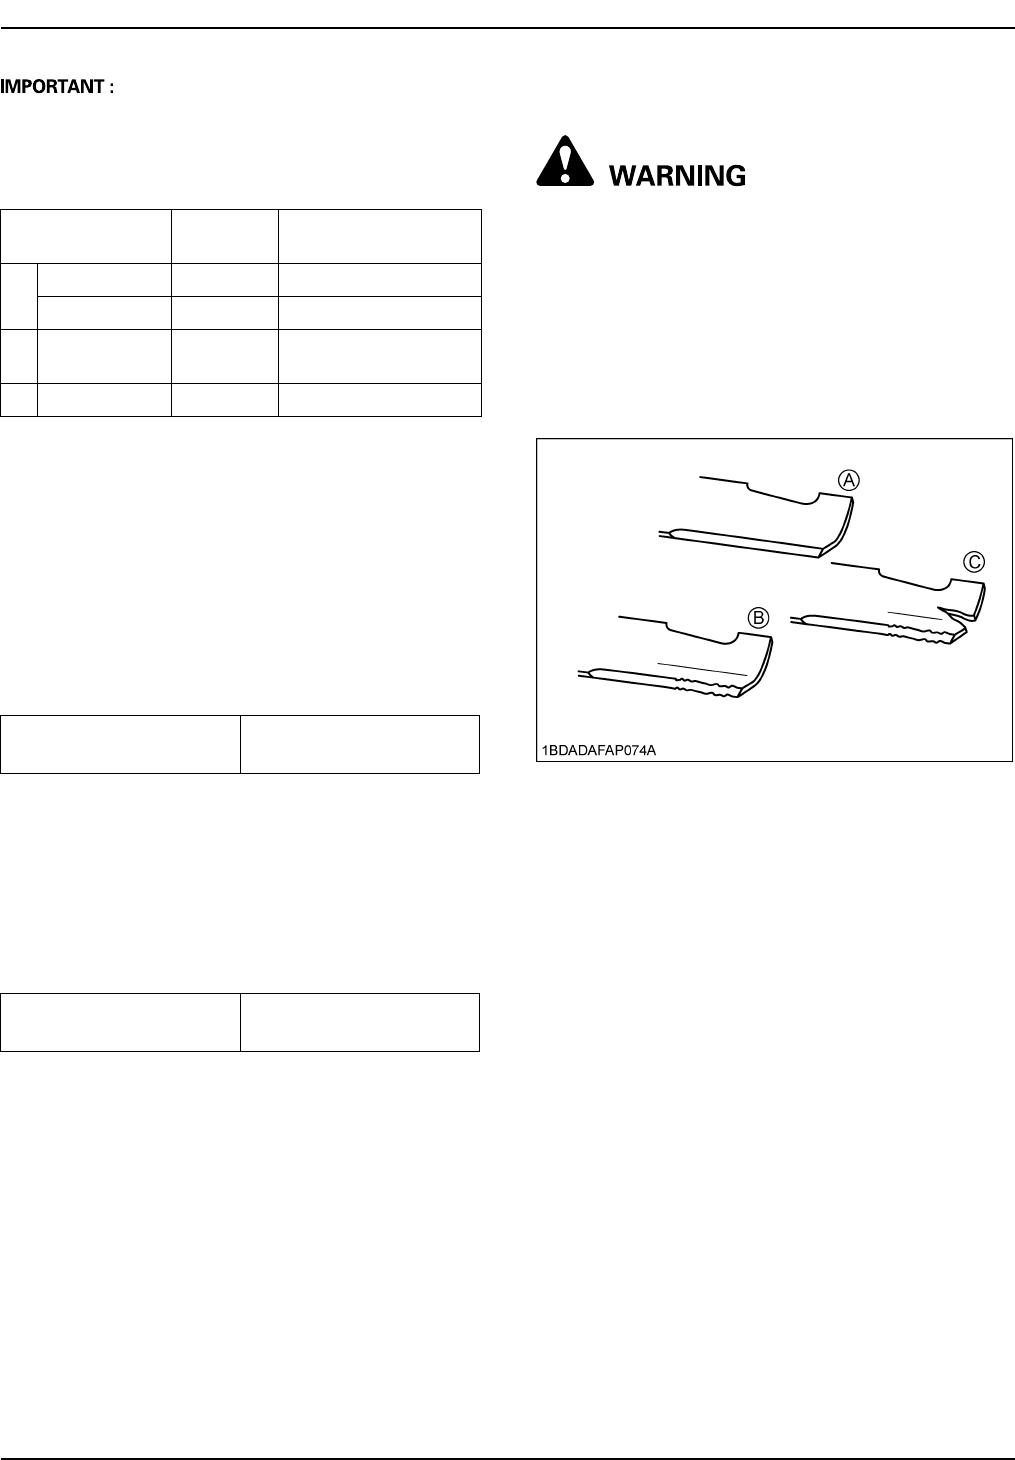 Cool Handleiding Kubota T1880 Pagina 68 Van 78 English Wiring 101 Olytiaxxcnl